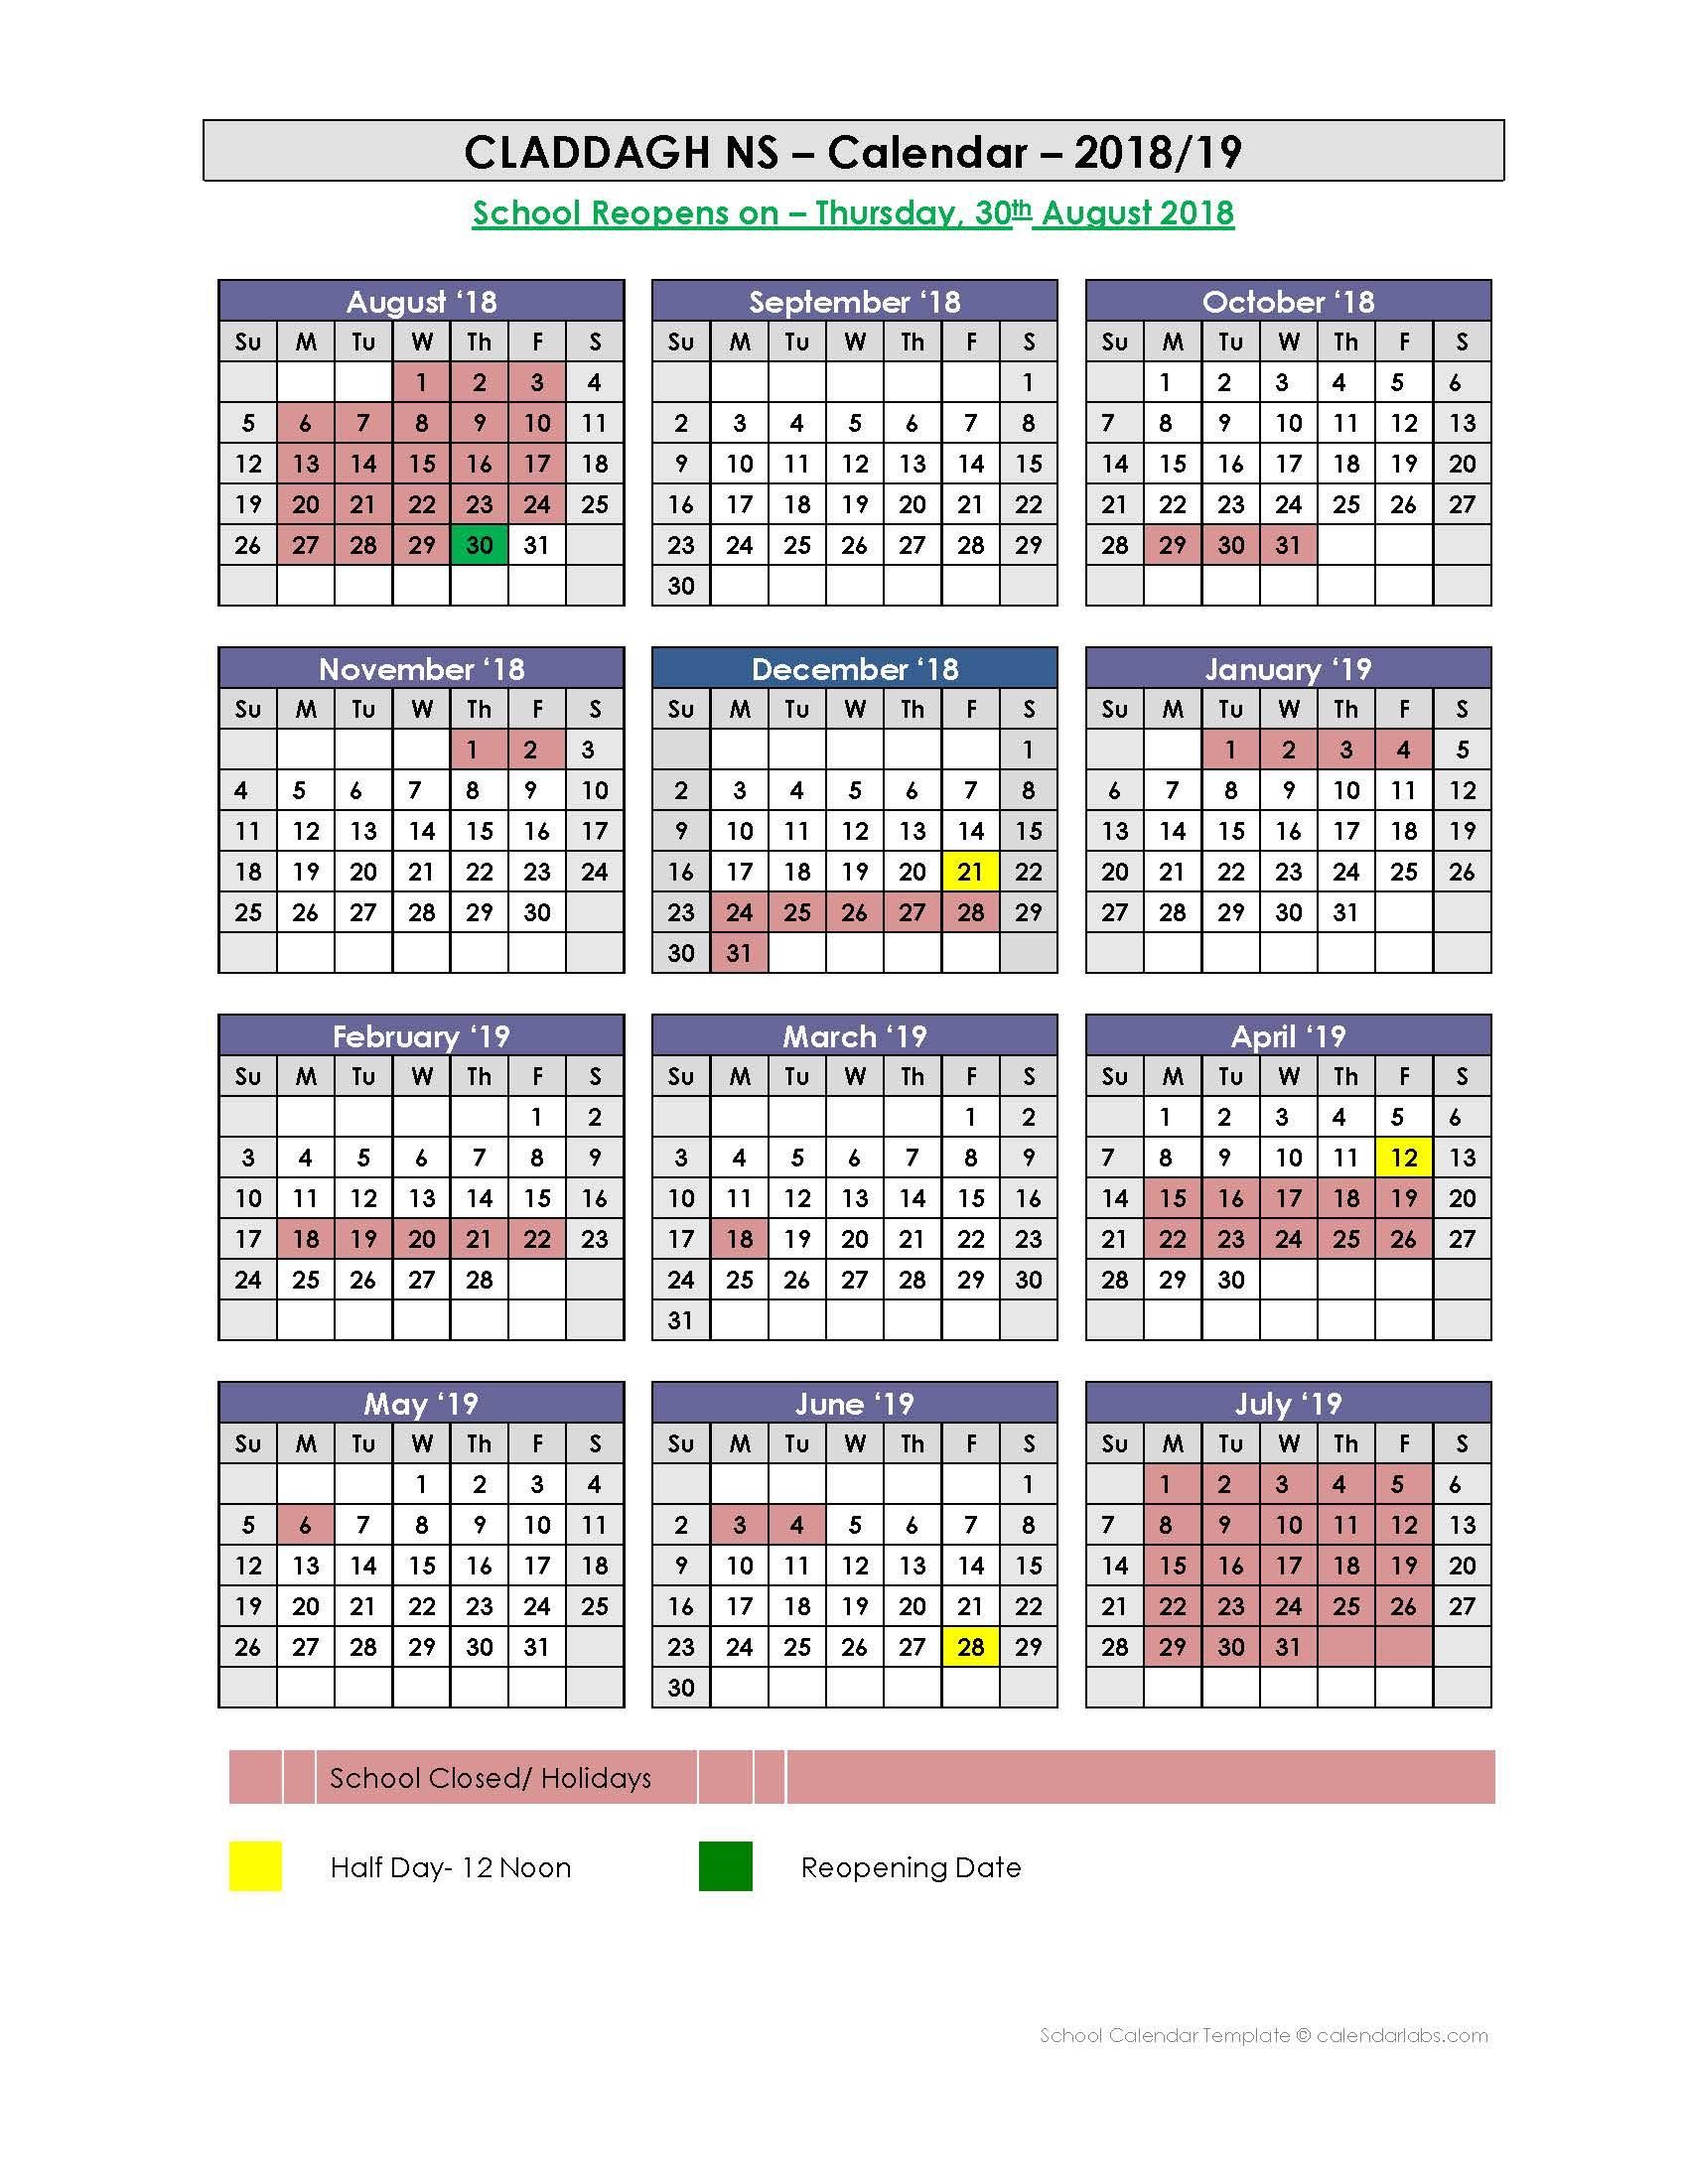 CladdaghNS_2018-19_School_Calendar.jpg